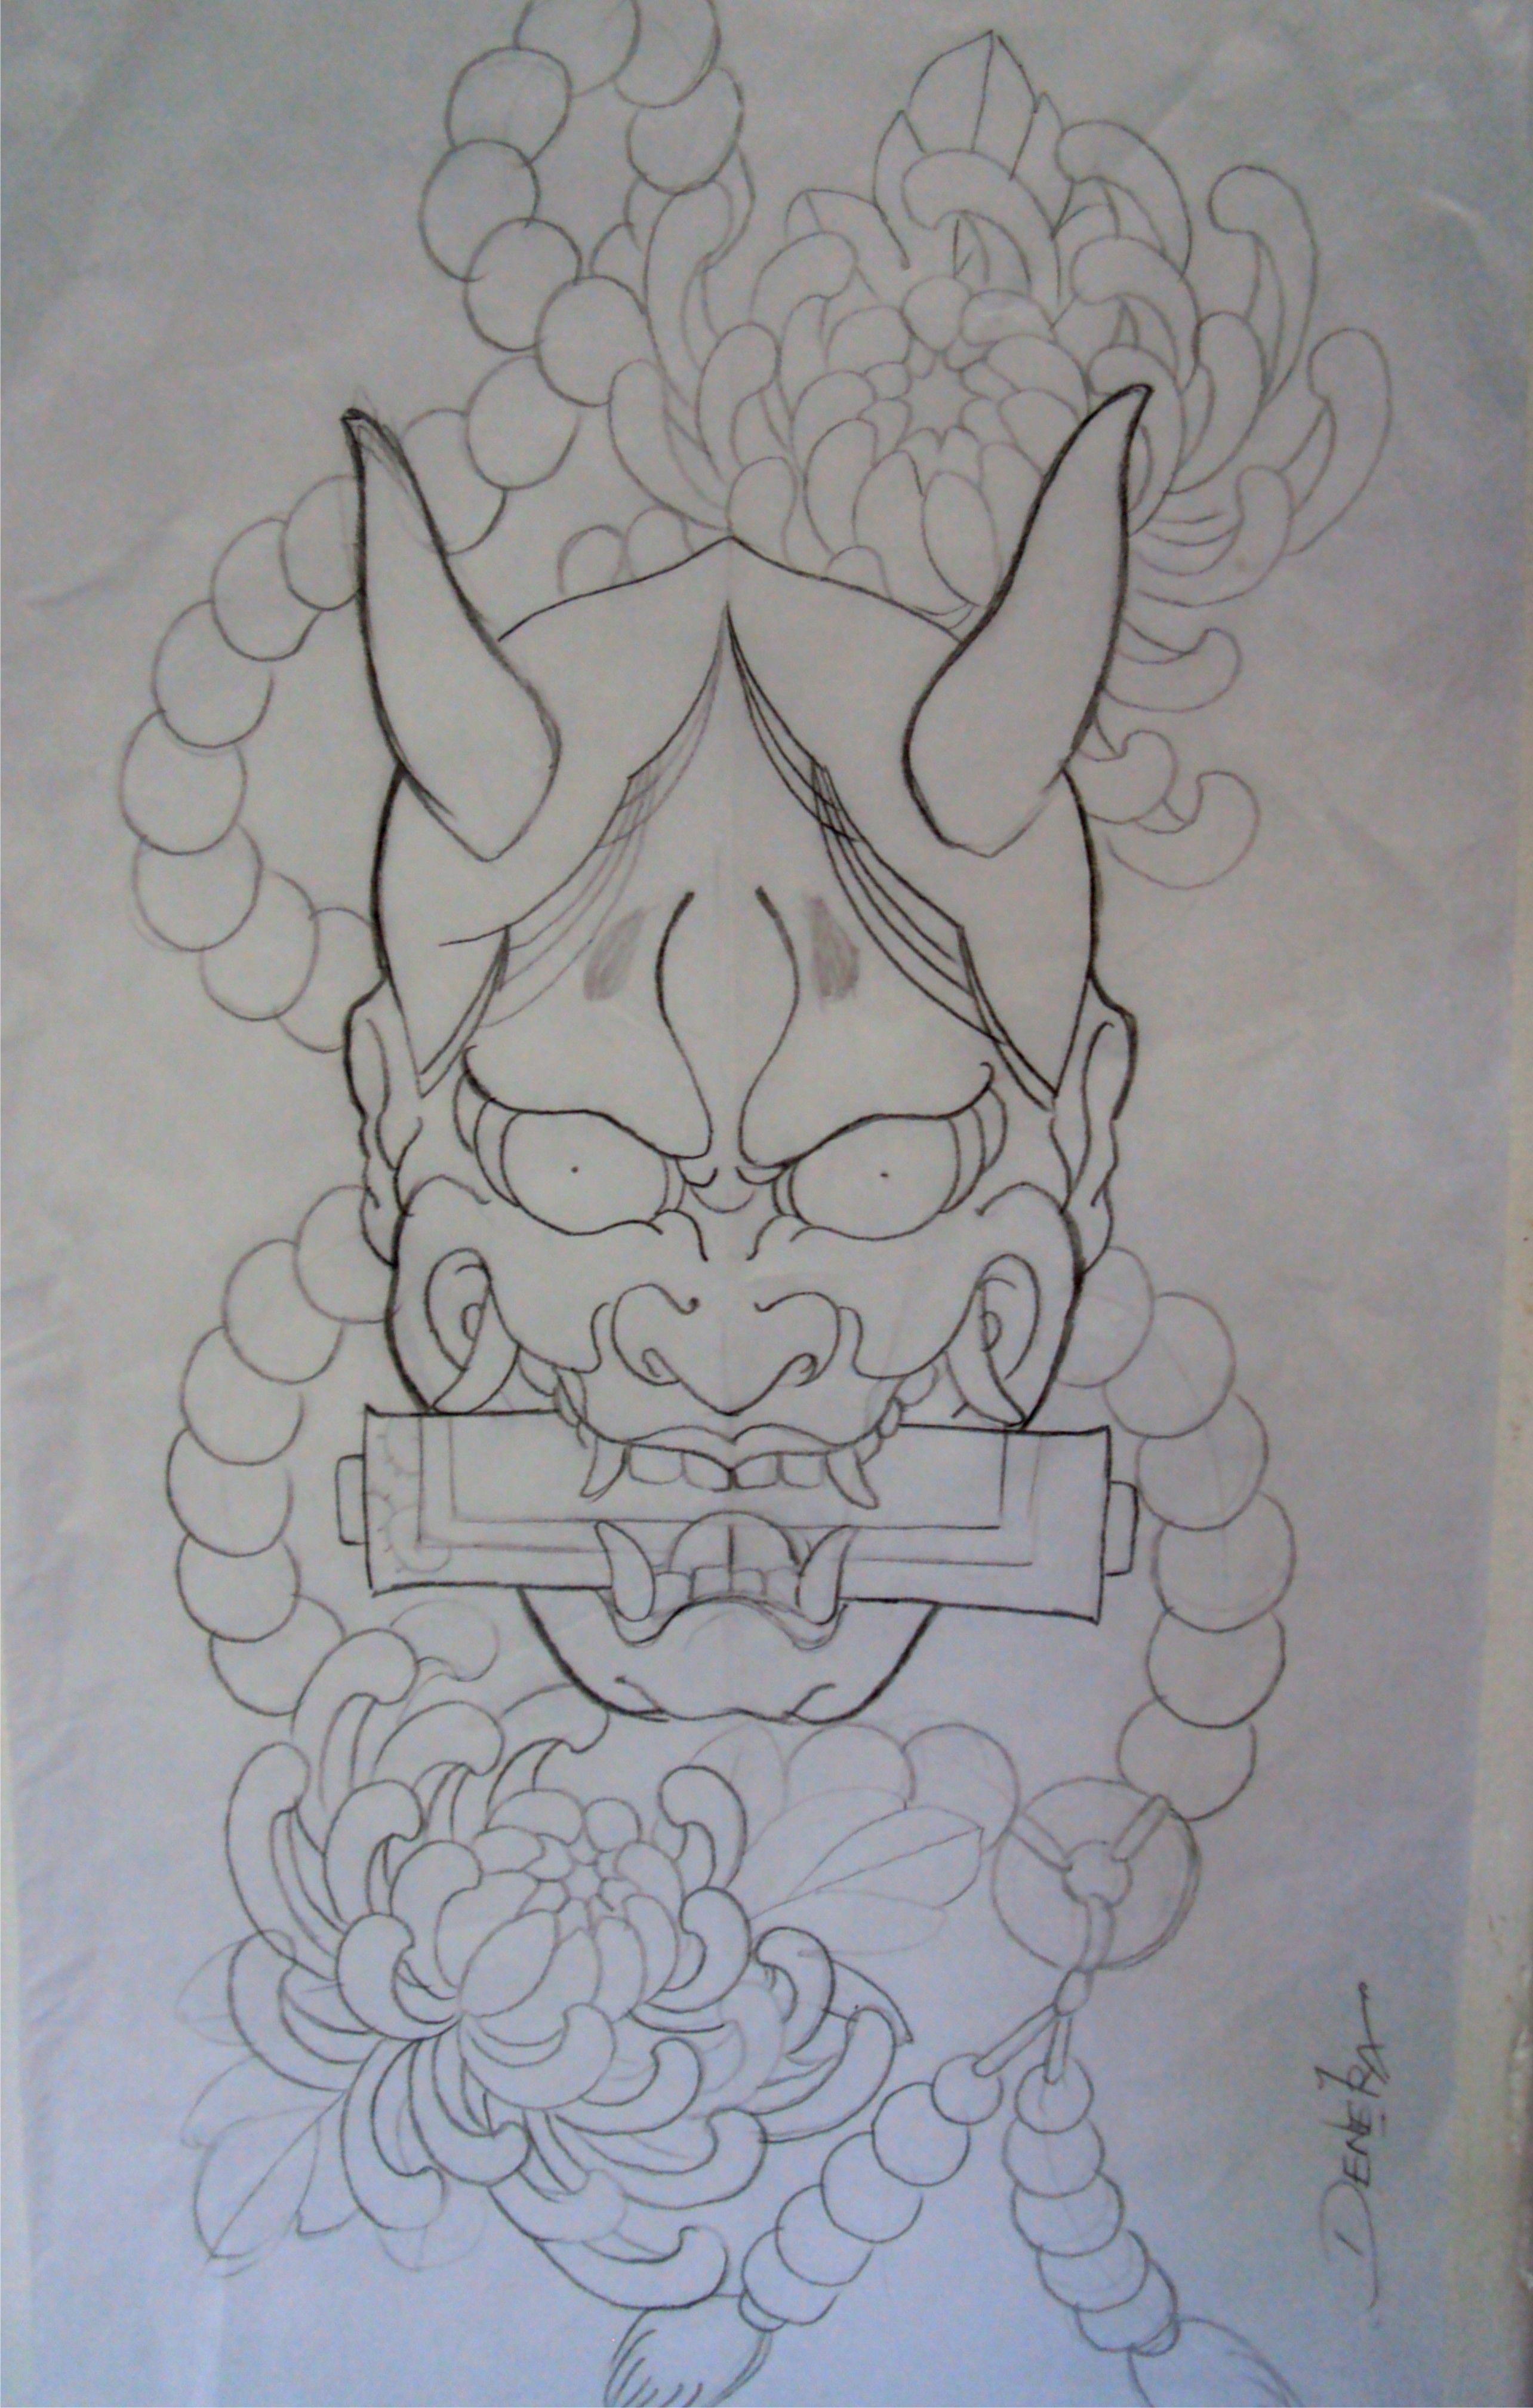 Traditional Japanese Mask Tattoo Japanesetattoos Japanese Tattoo Samurai Tattoo Design Japanese Mask Tattoo